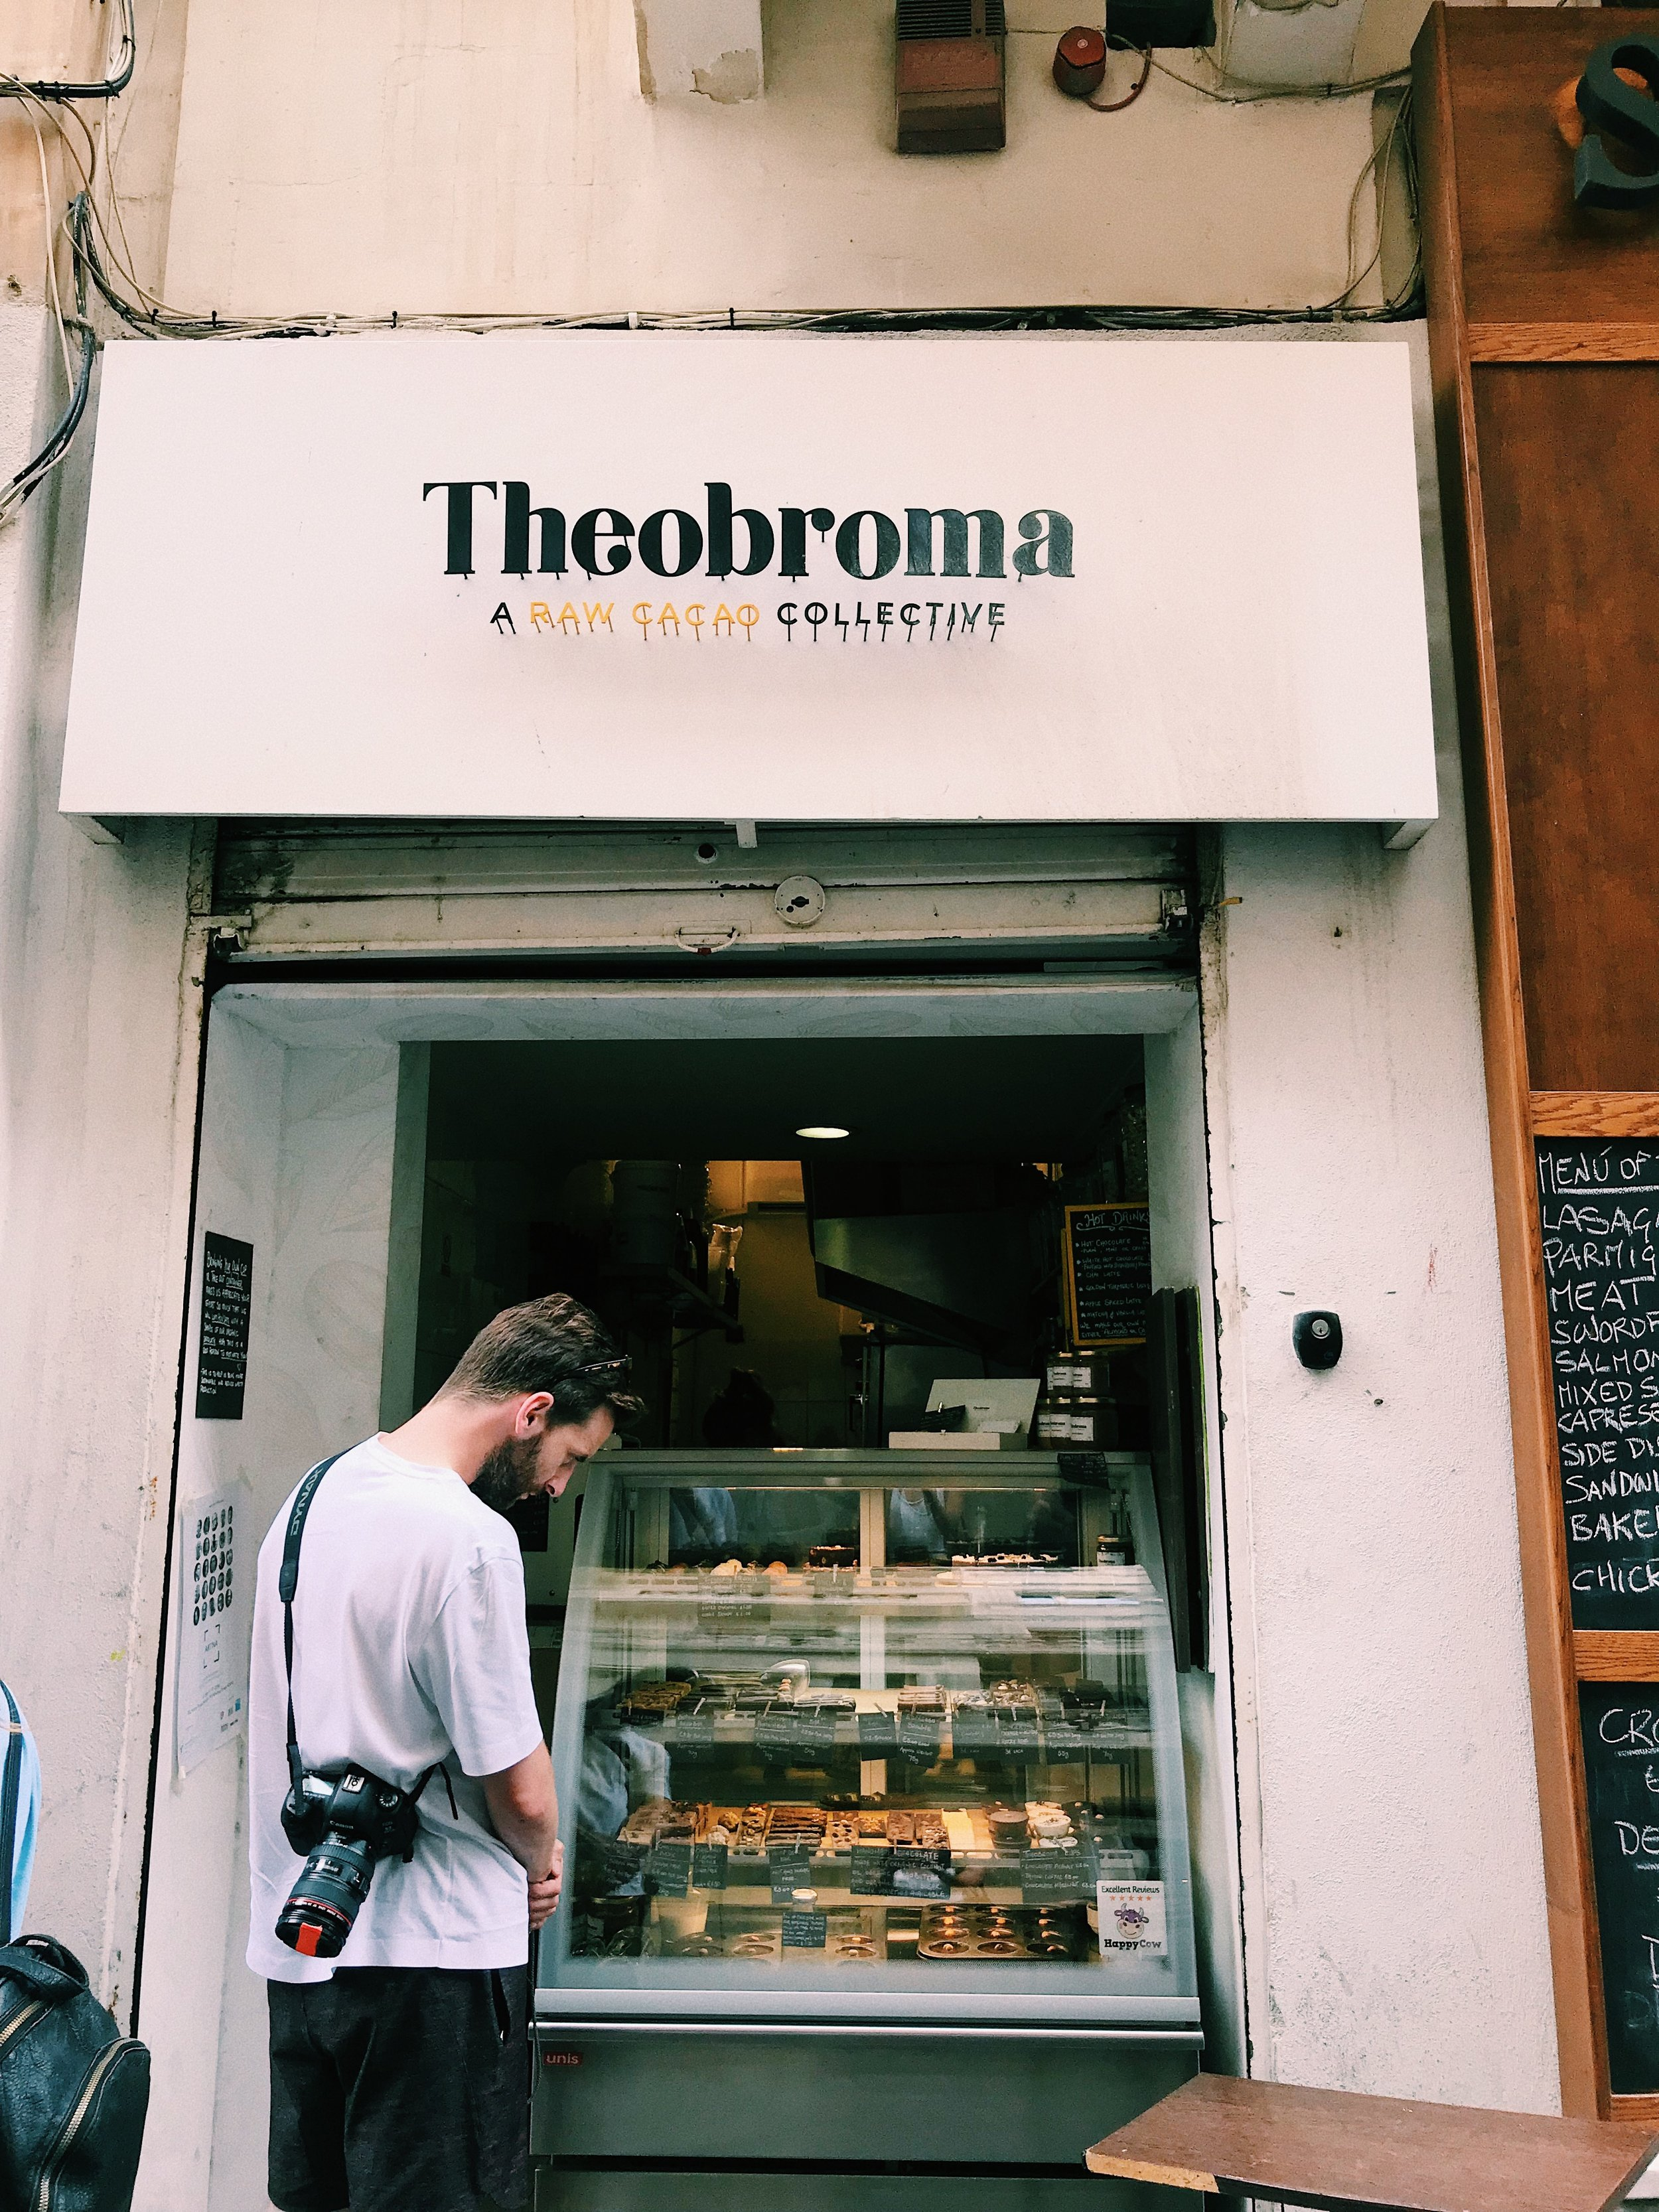 theobroma-dairy-free-chocolate